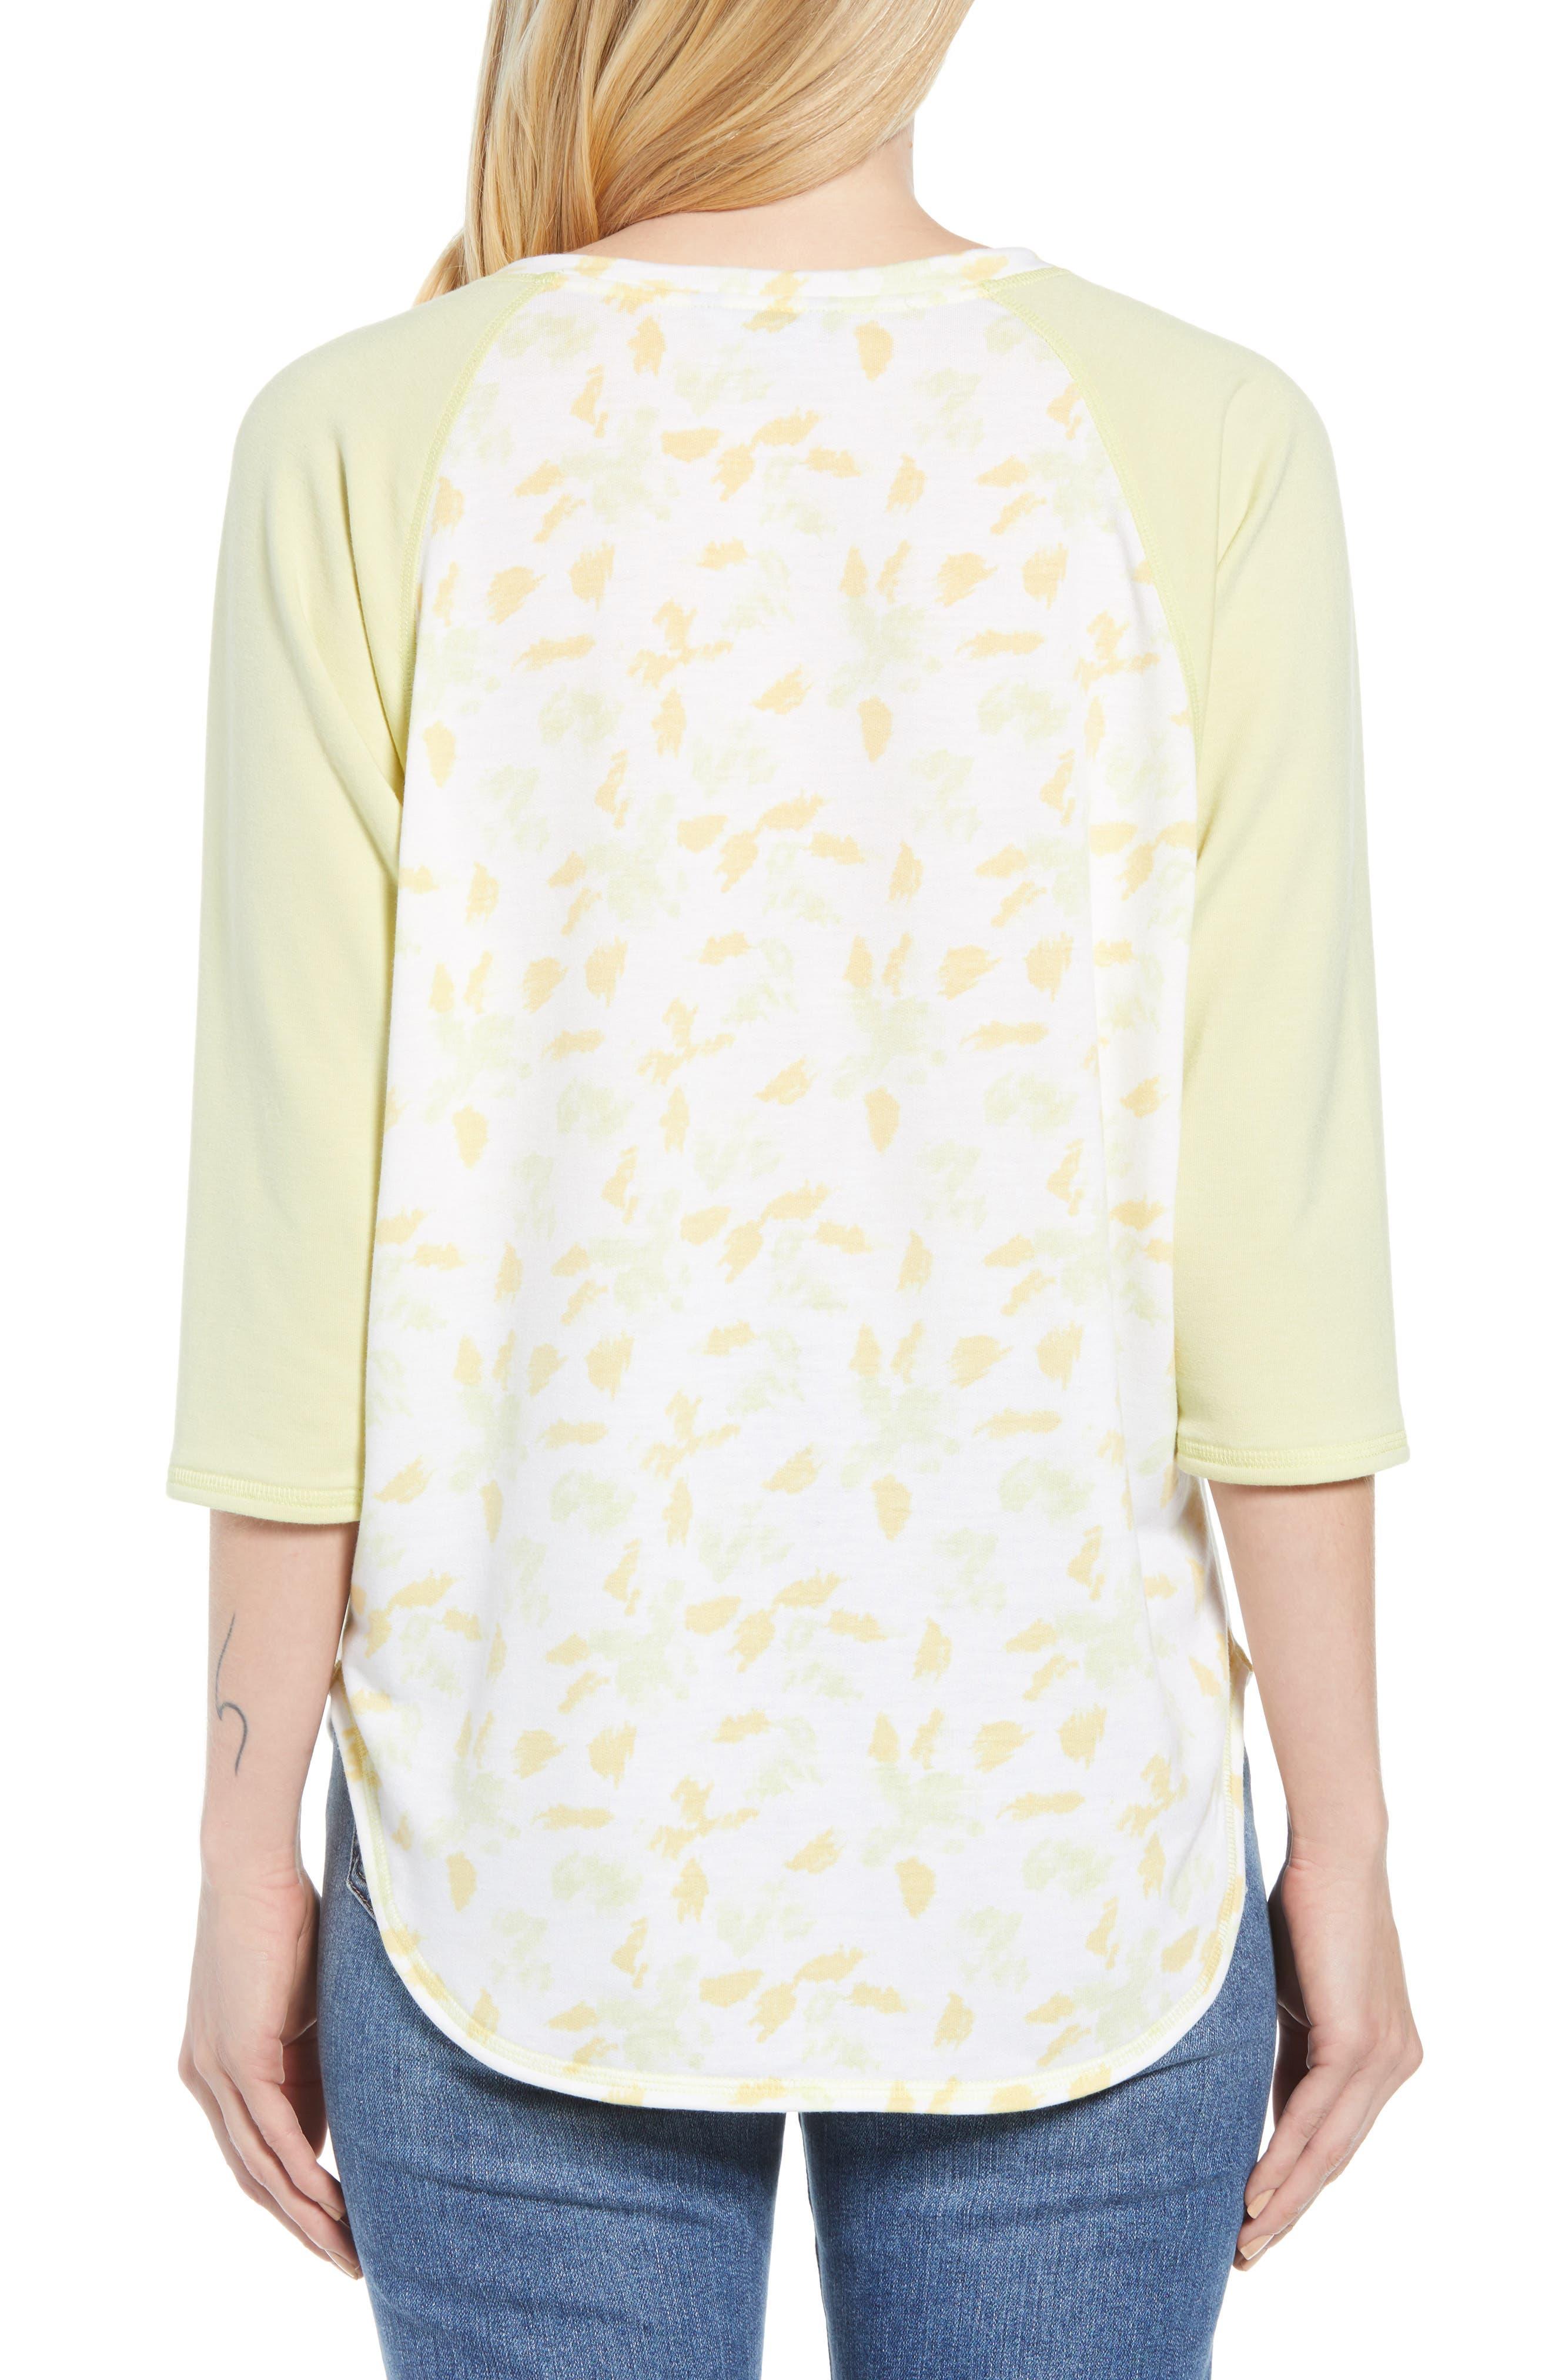 Off Duty Raglan Sleeve Sweatshirt,                             Alternate thumbnail 2, color,                             Ivory- Yellow Fleurs De Laine